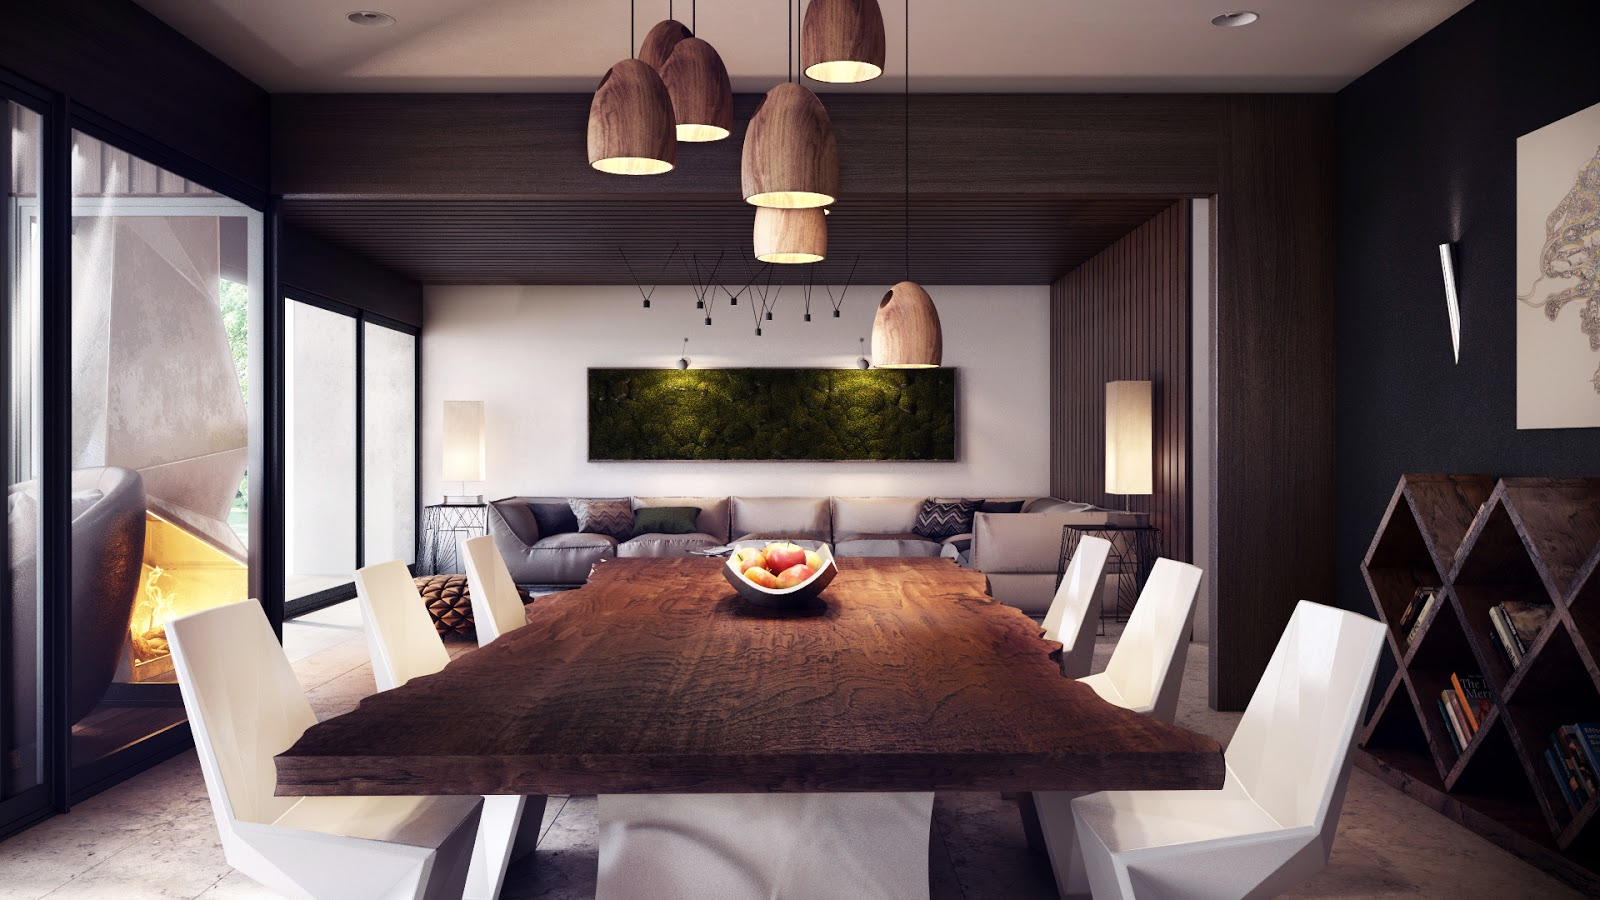 modern open living space Interior Design Ideas. - ^